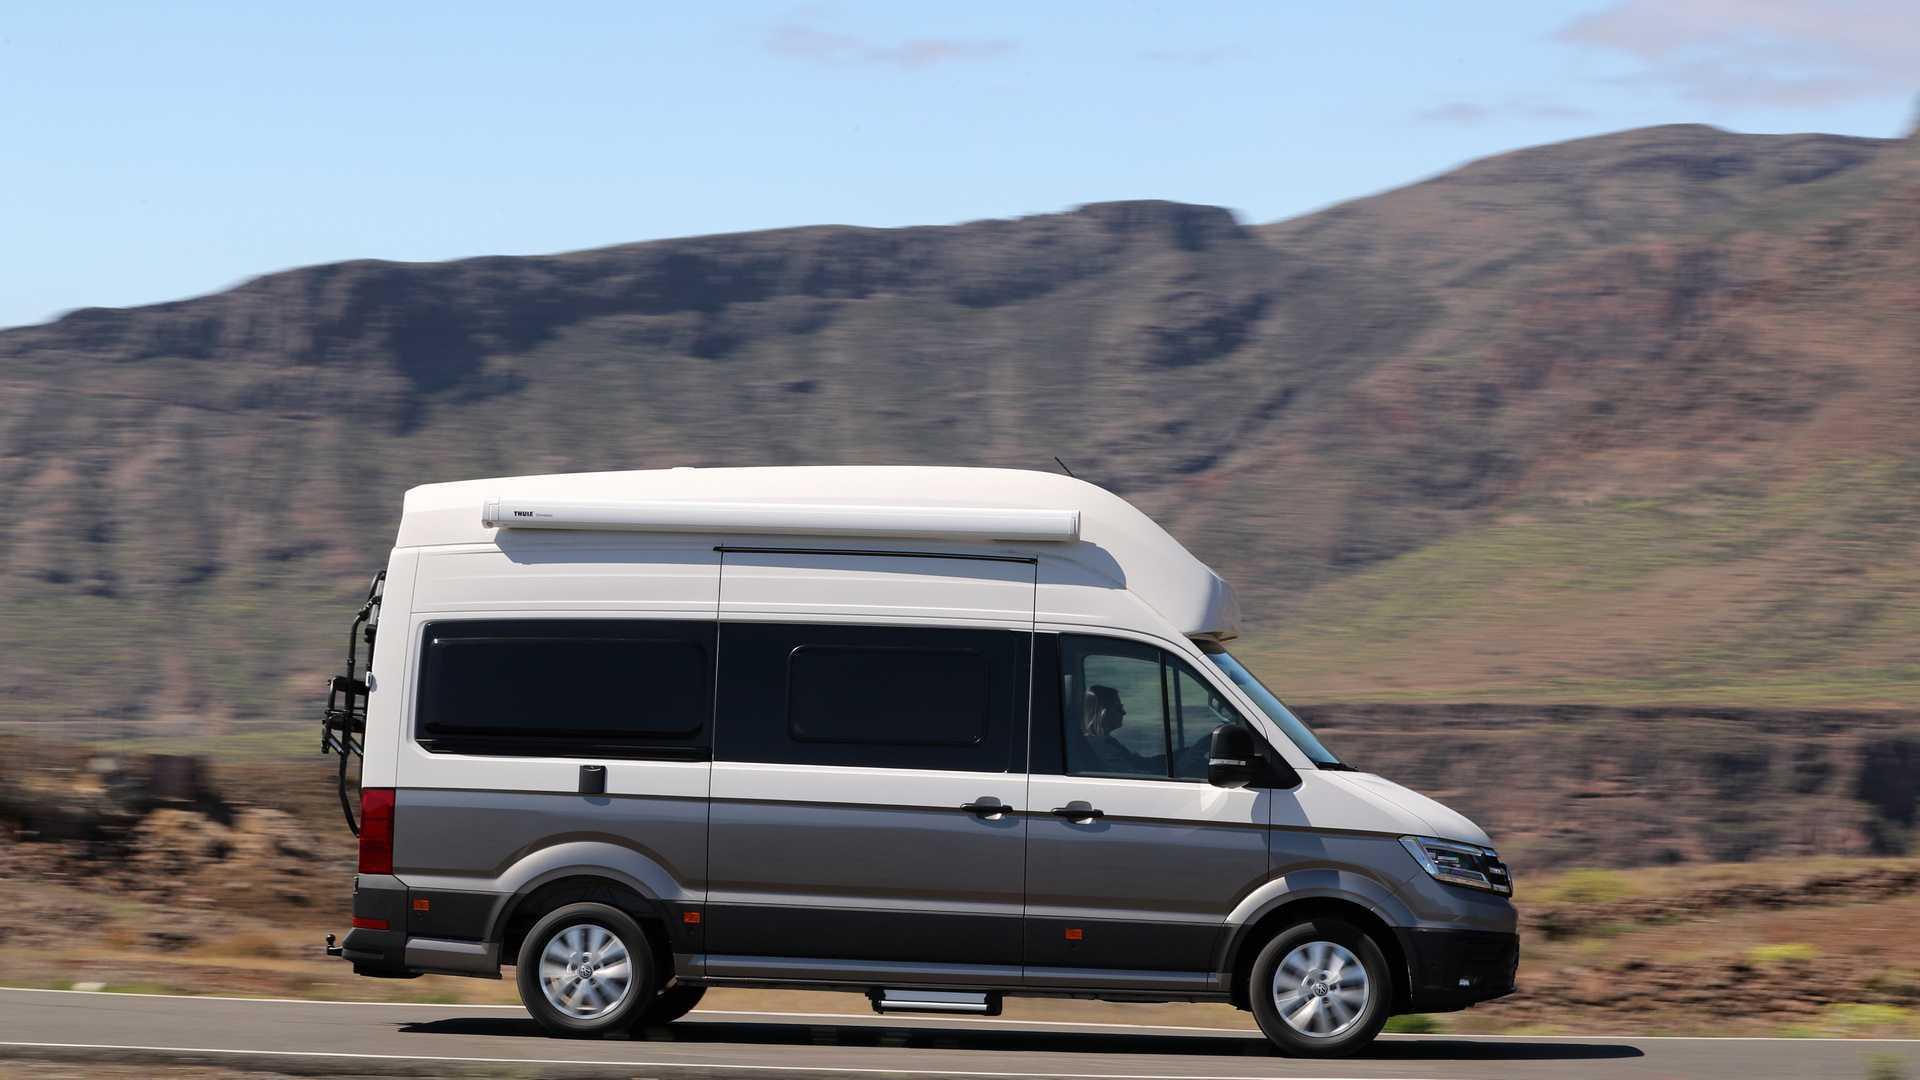 Volkswagen Grand California 2019, la autocaravana a lo grande